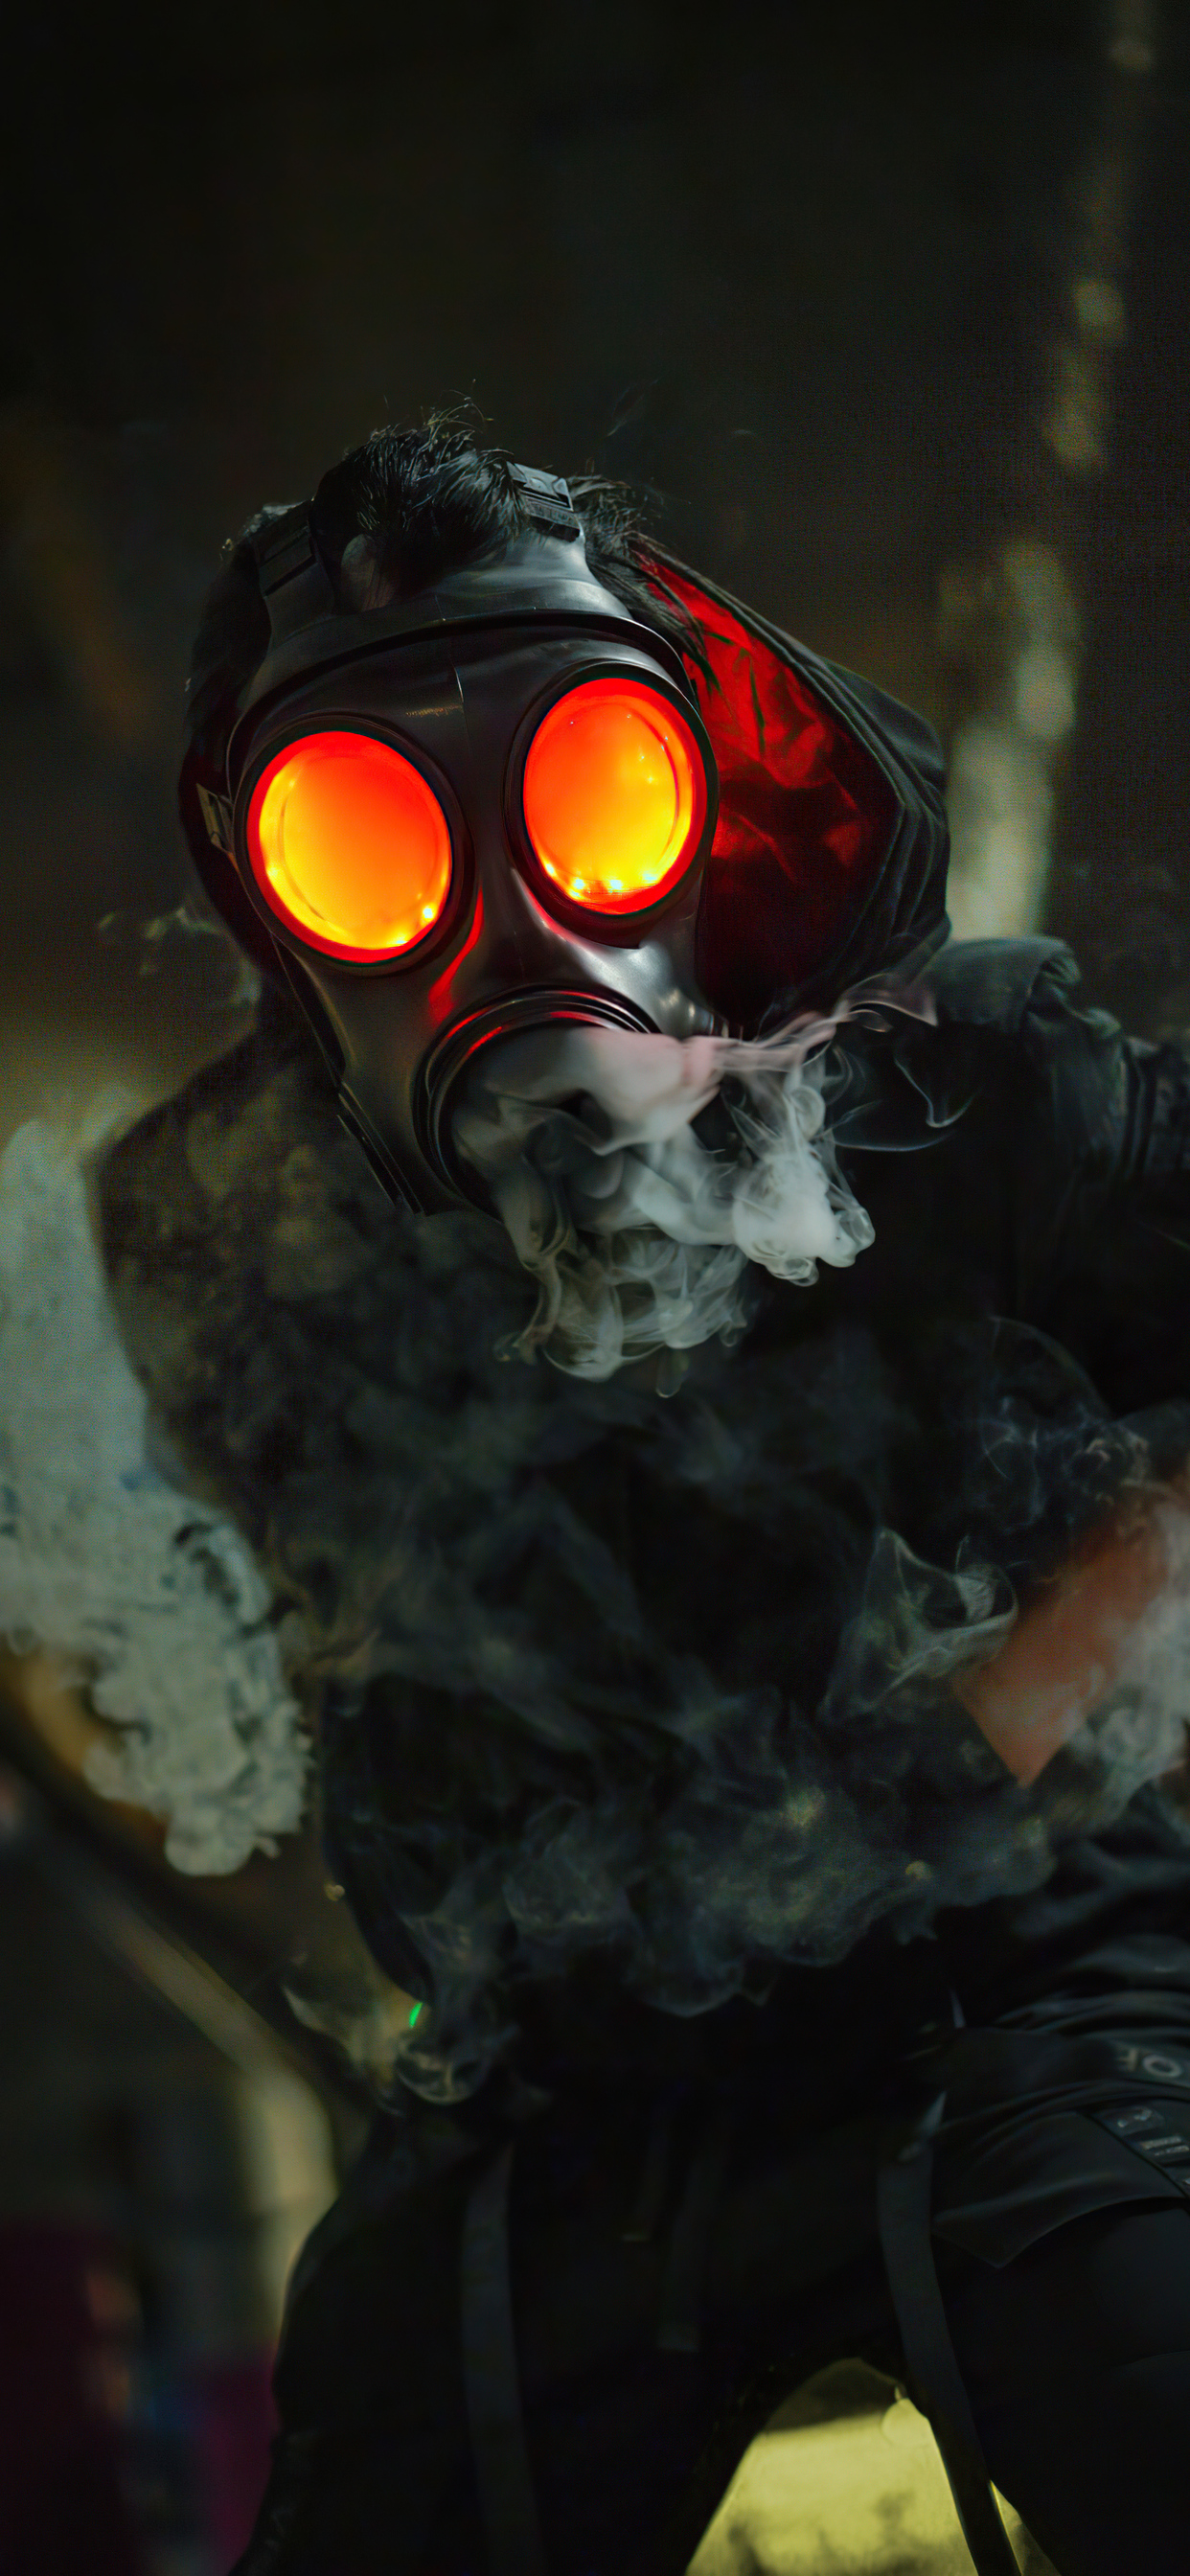 gas-mask-glowing-eyes-5k-ob.jpg